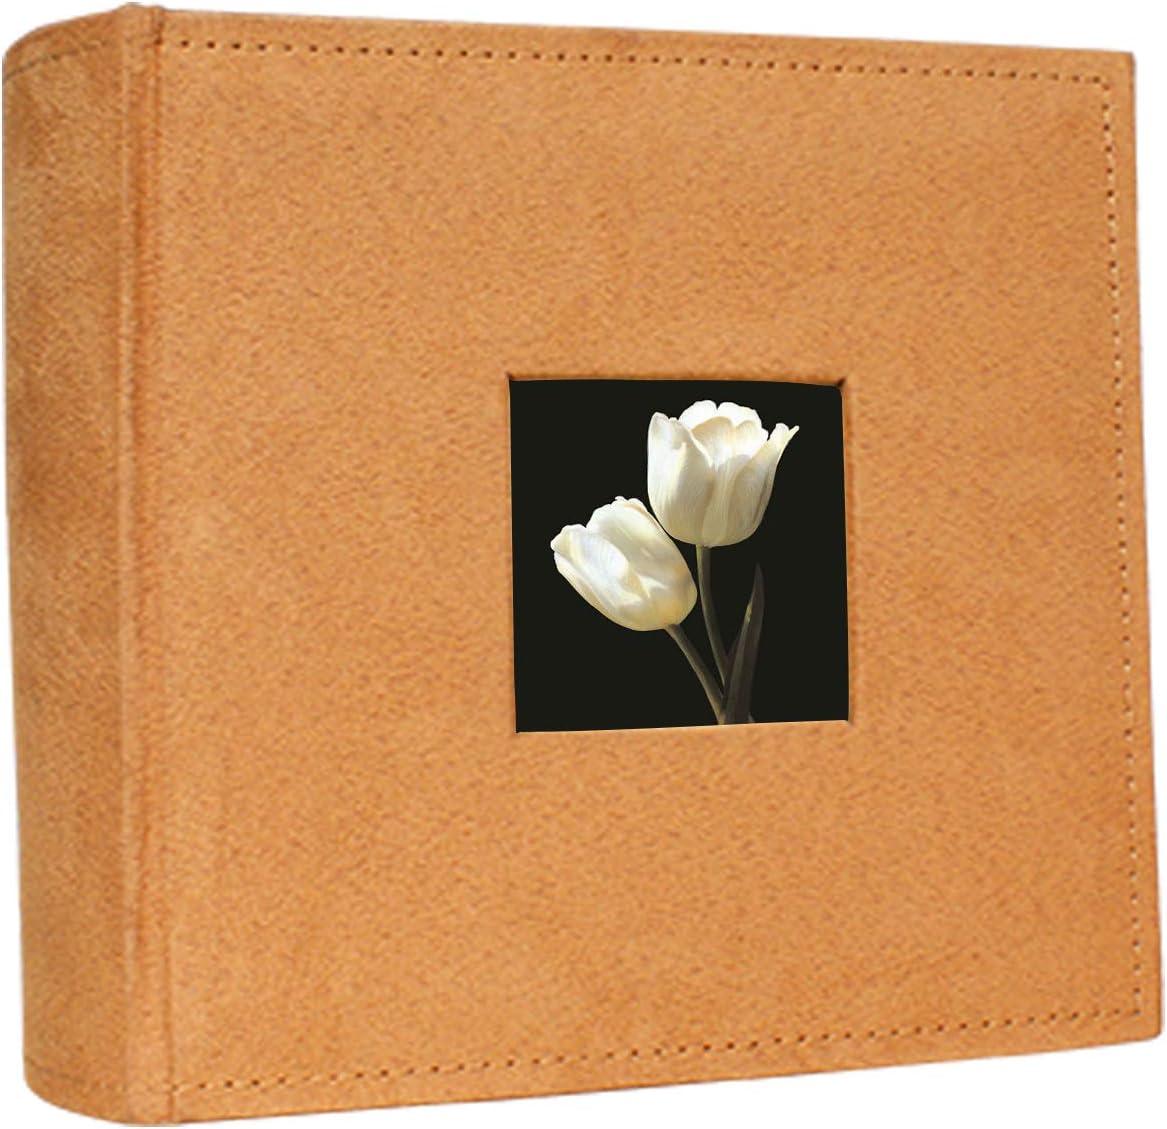 Flannel Cover Features a Frame ERBAO Memo Photo Album 4x6 200 Photos Orange